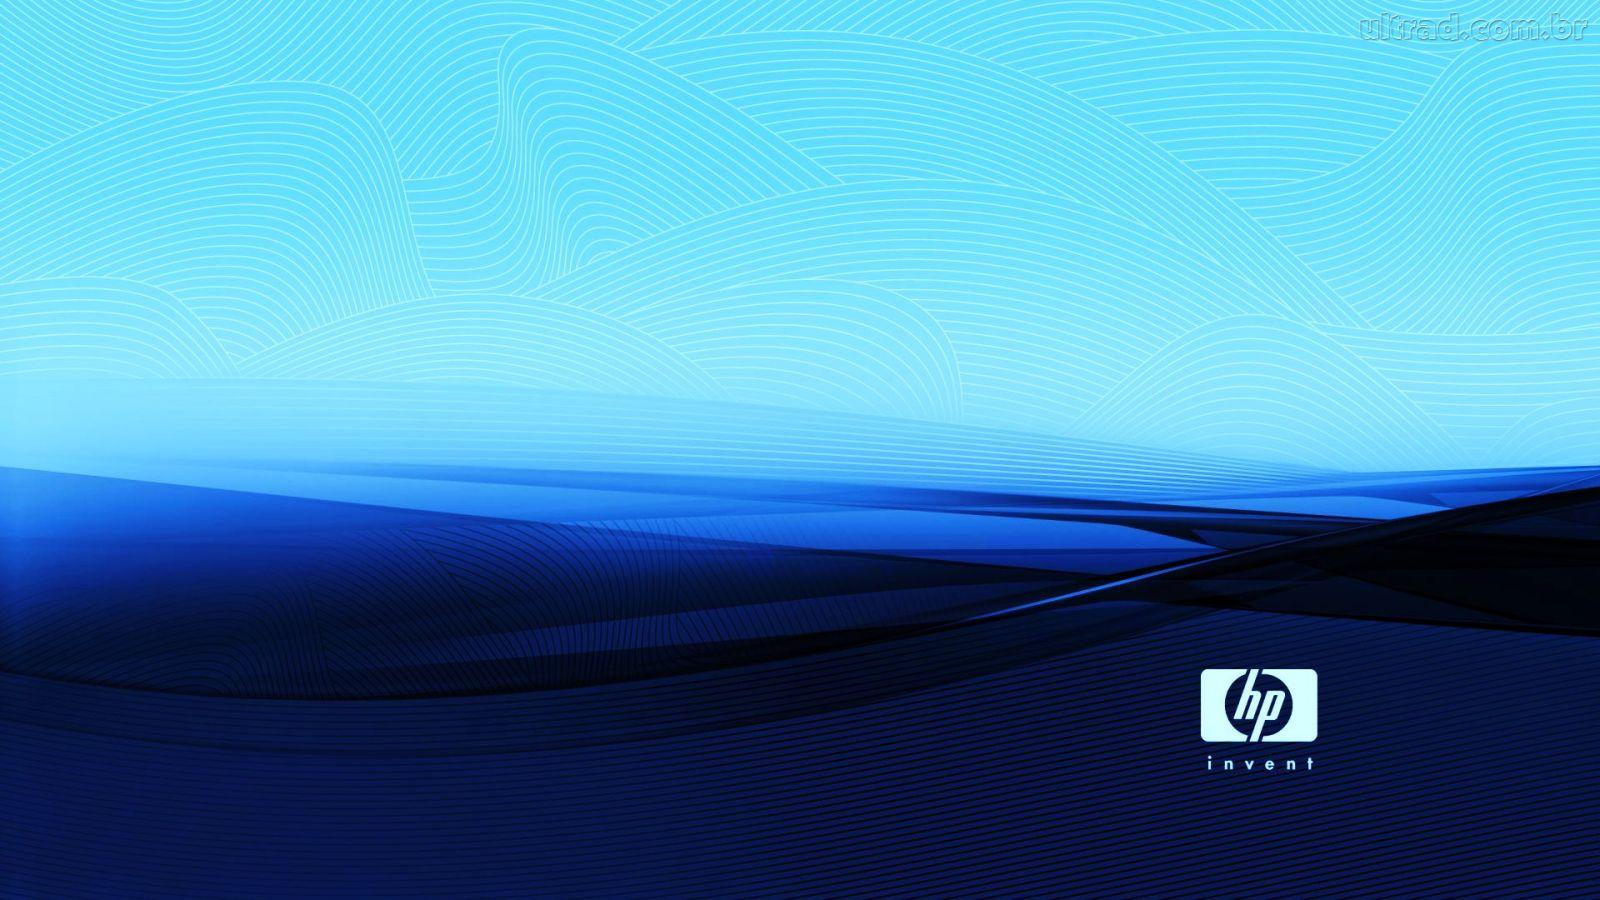 HP Wallpaper 1600x900